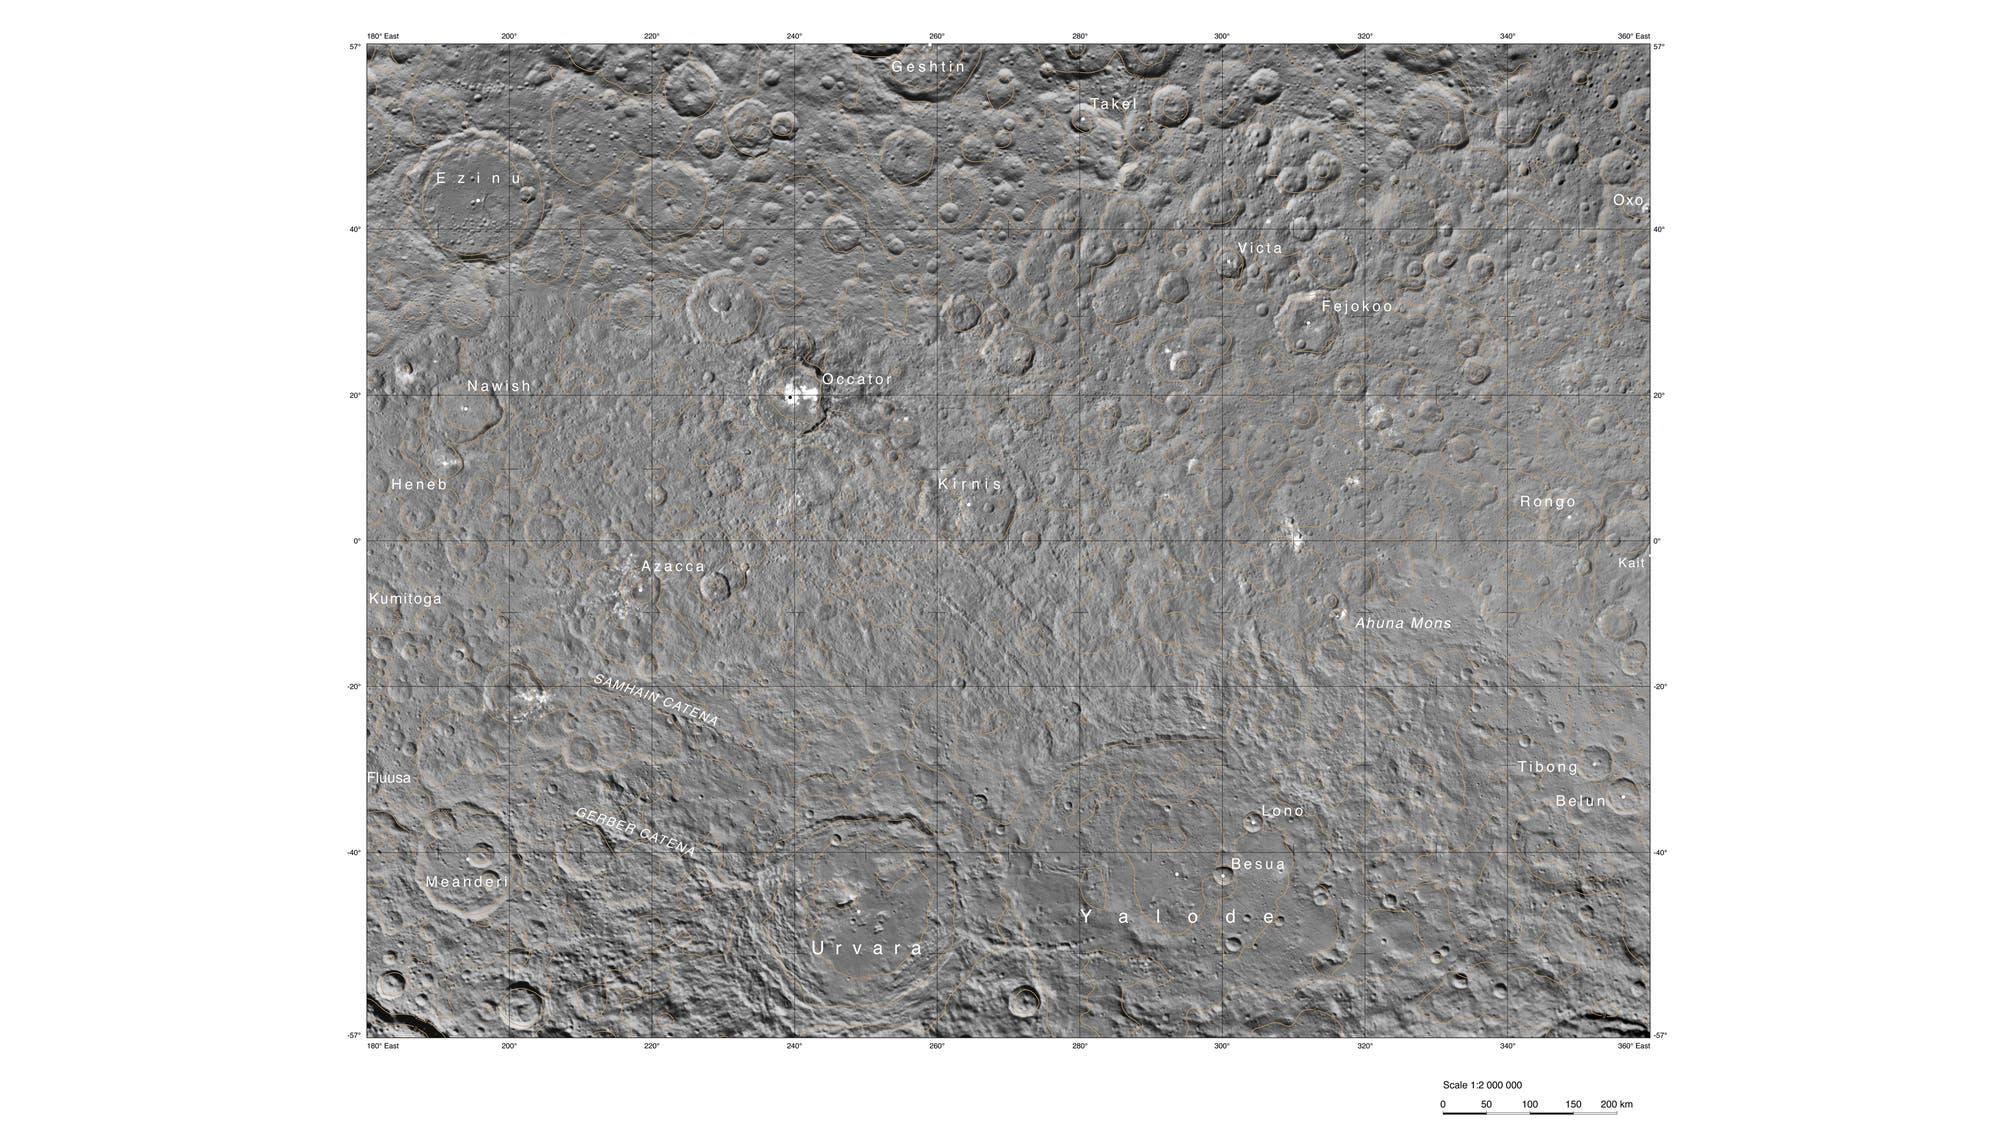 Die Occator-Hemisphäre von Ceres (400-Meter-Karte)